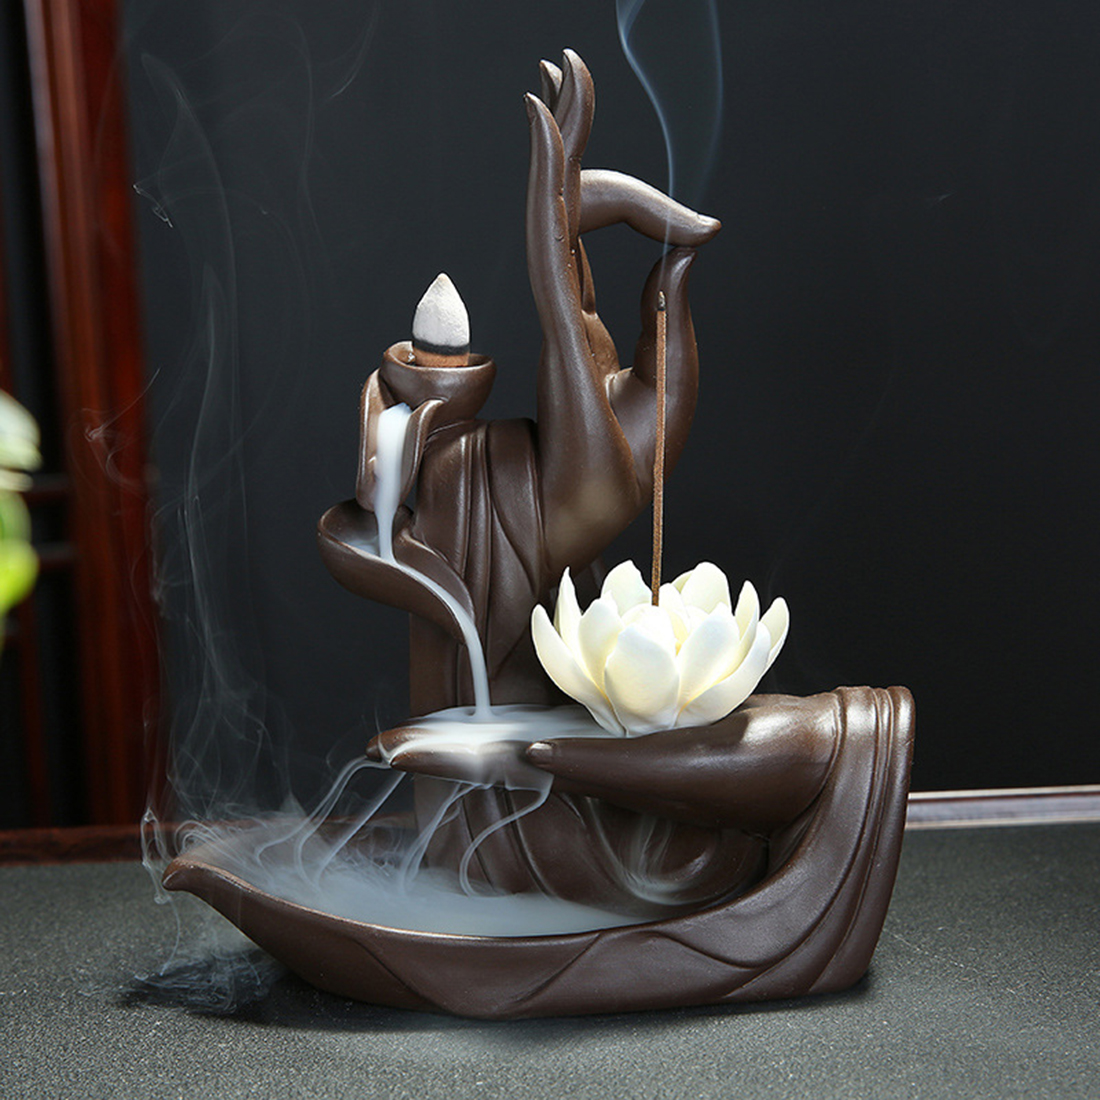 Ceramic Backflow Incense Burner Tathagata Buddha Lotus Incense Cones Stick Holder Smoke Waterfall Creative Home Bouddha Decor